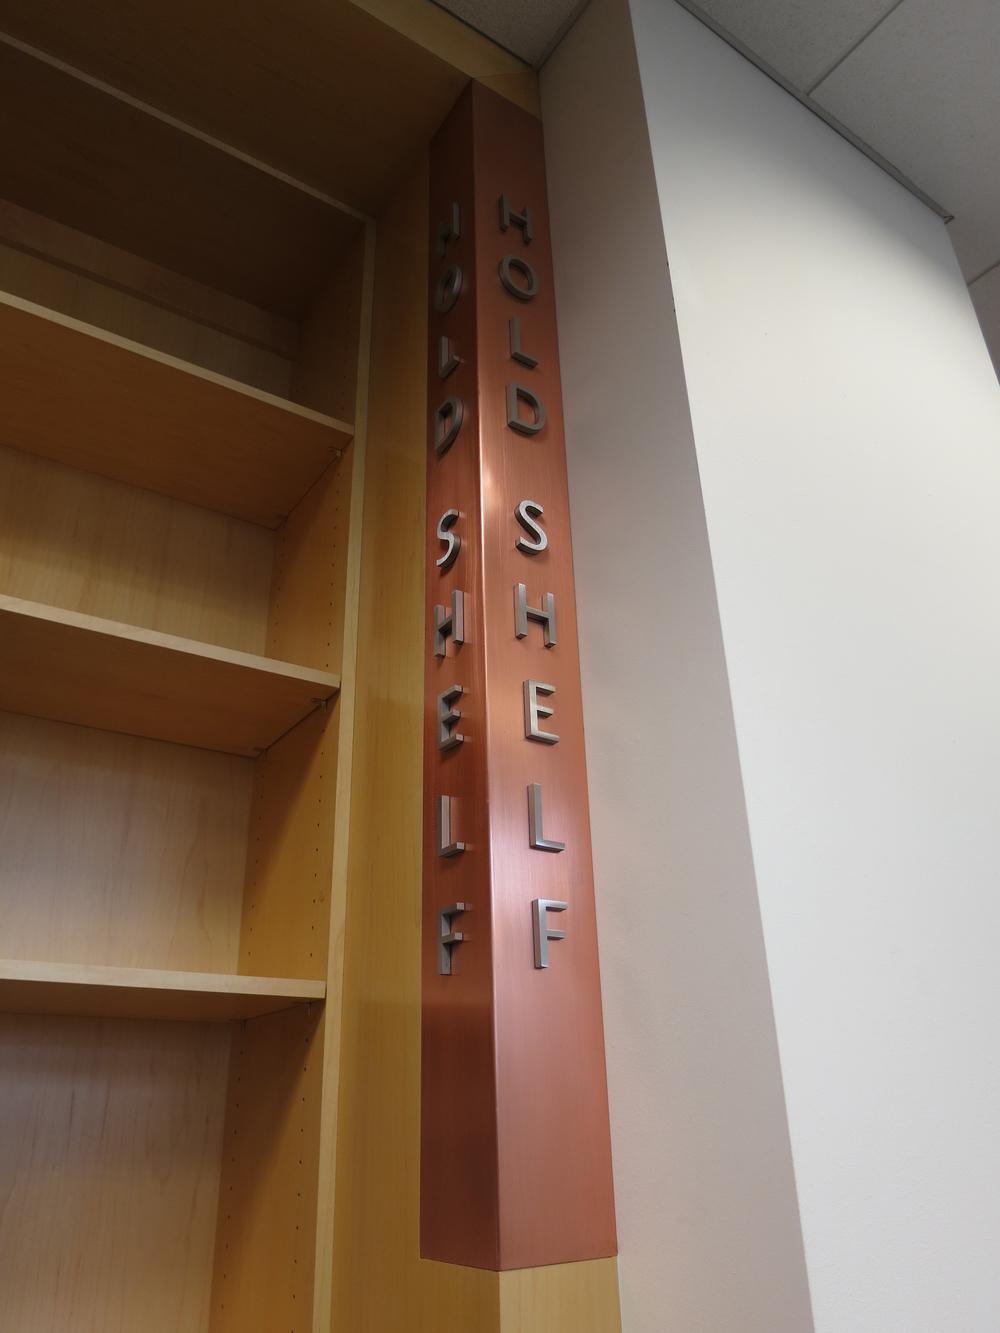 Cudahy Library